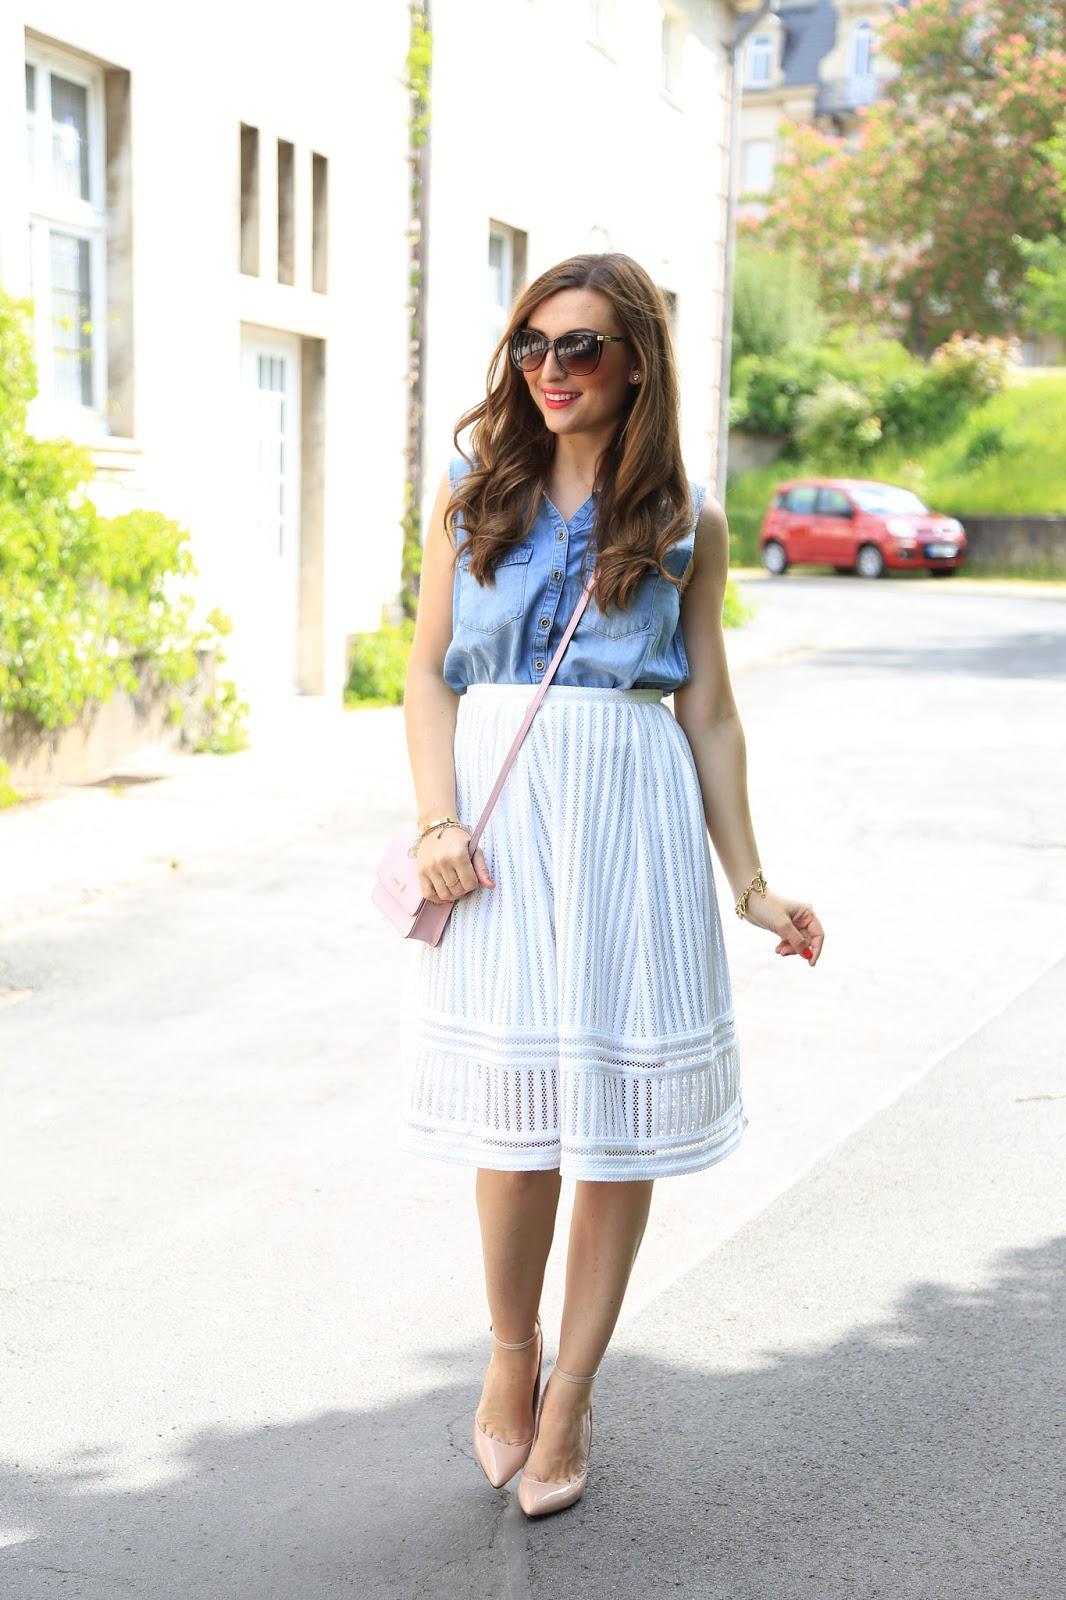 Fashionstylebyjohanna Blogger aus Frankfurt - Frankfurt Fashionblogge r